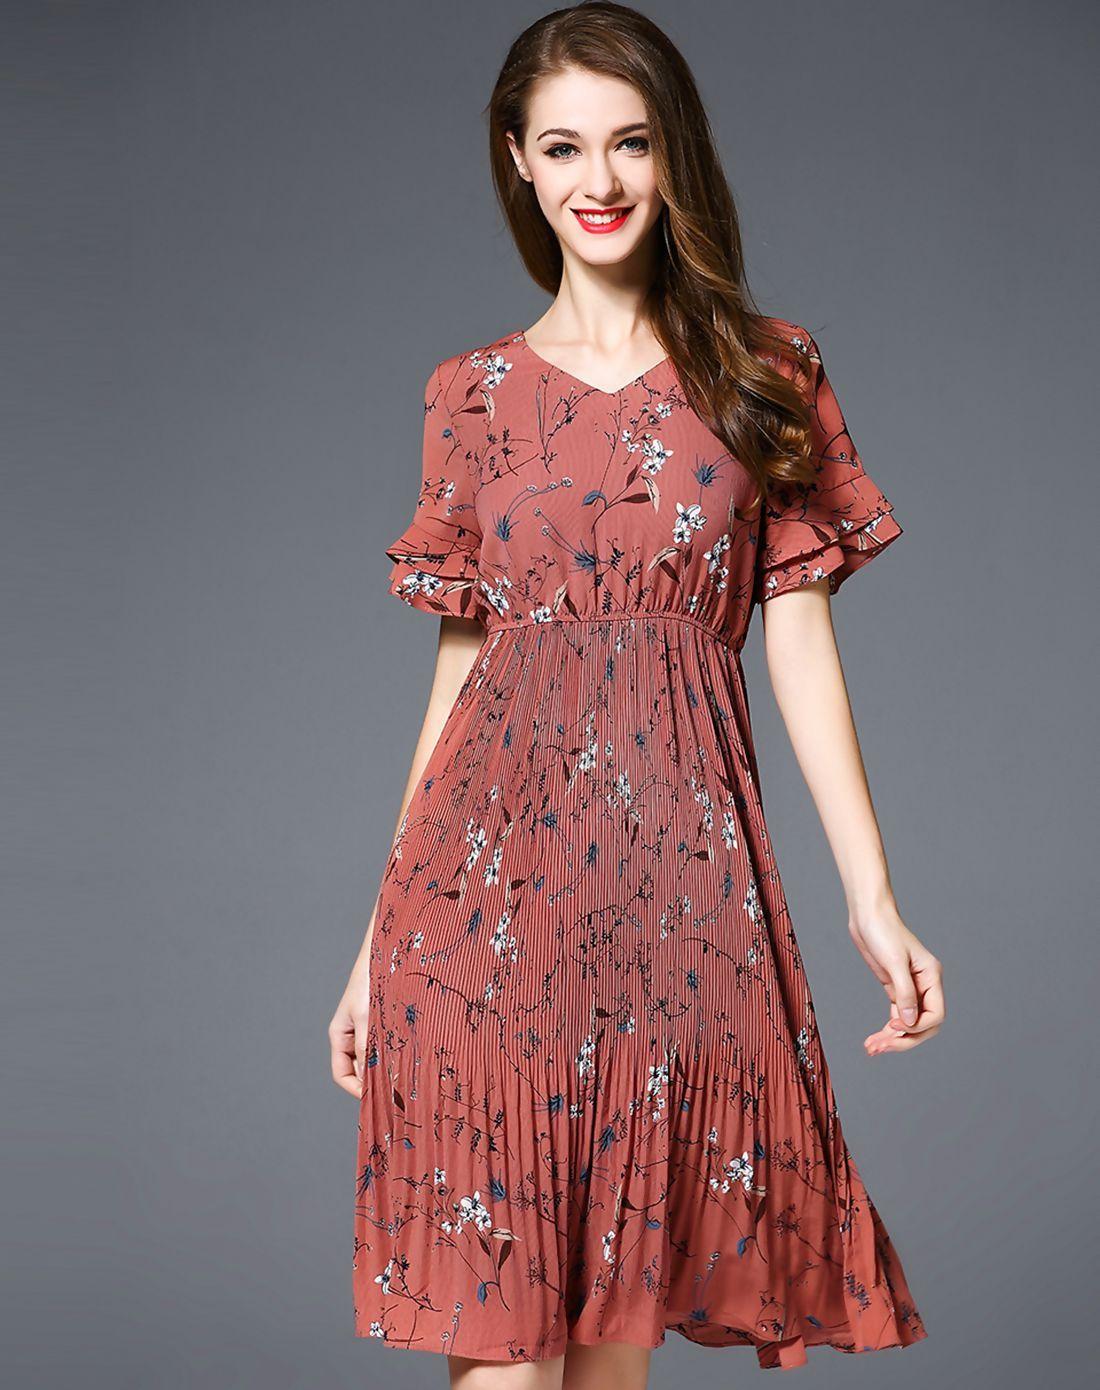 #AdoreWe #VIPme Swing Dresses❤️Designer ES·DANNUO Red Printed V Neck Bell Sleeve Swing Midi Dress - AdoreWe.com